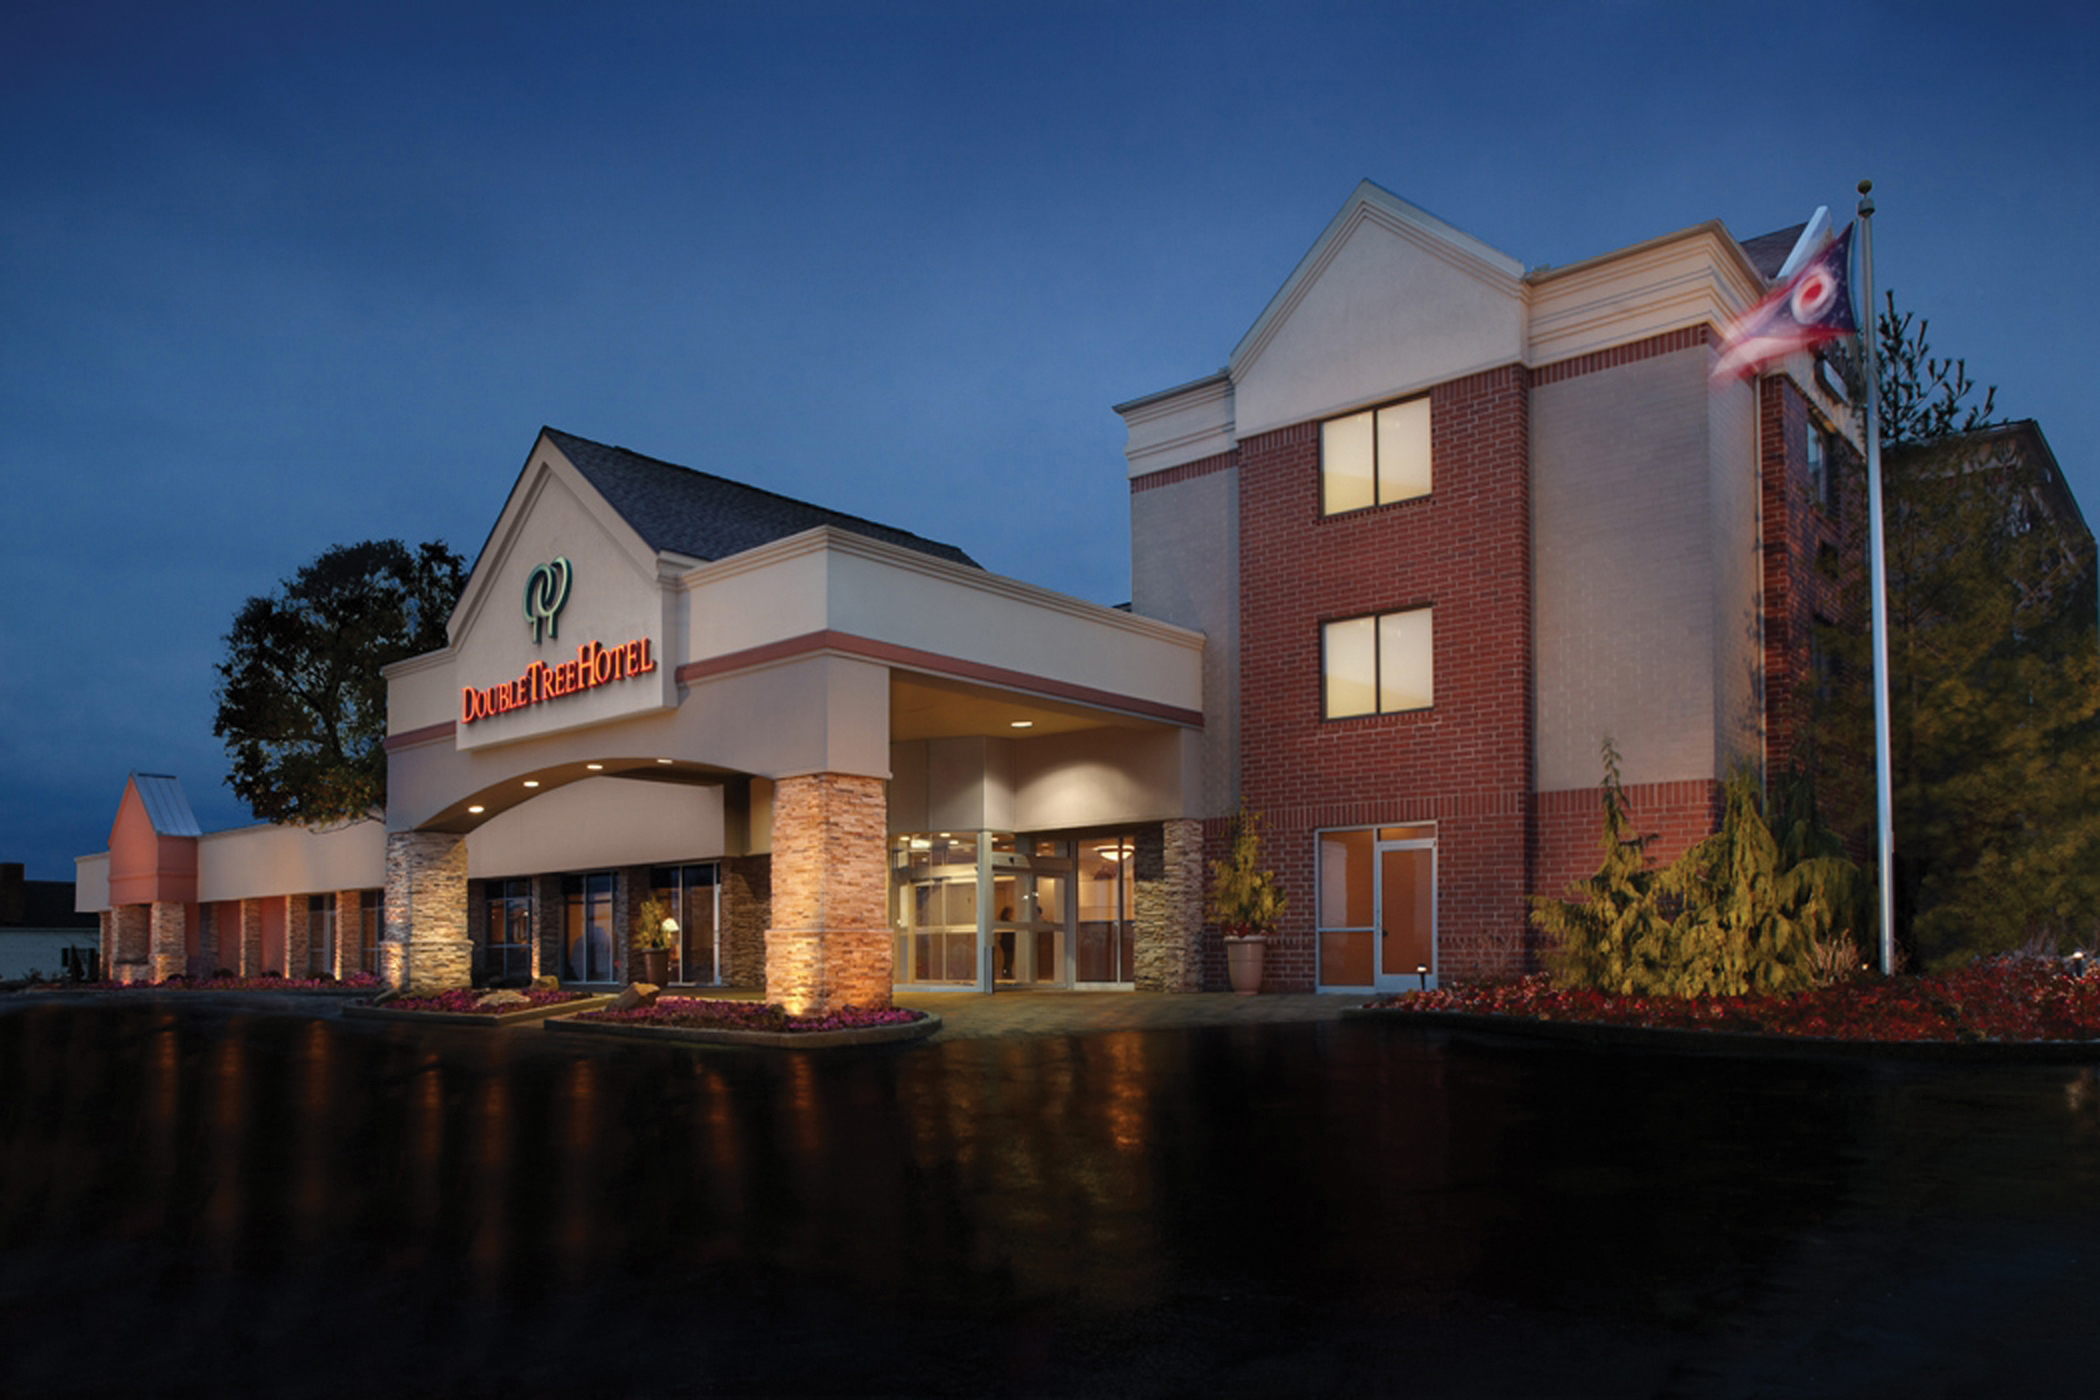 Doubletree By Hilton Hotel Akron Fairlawn